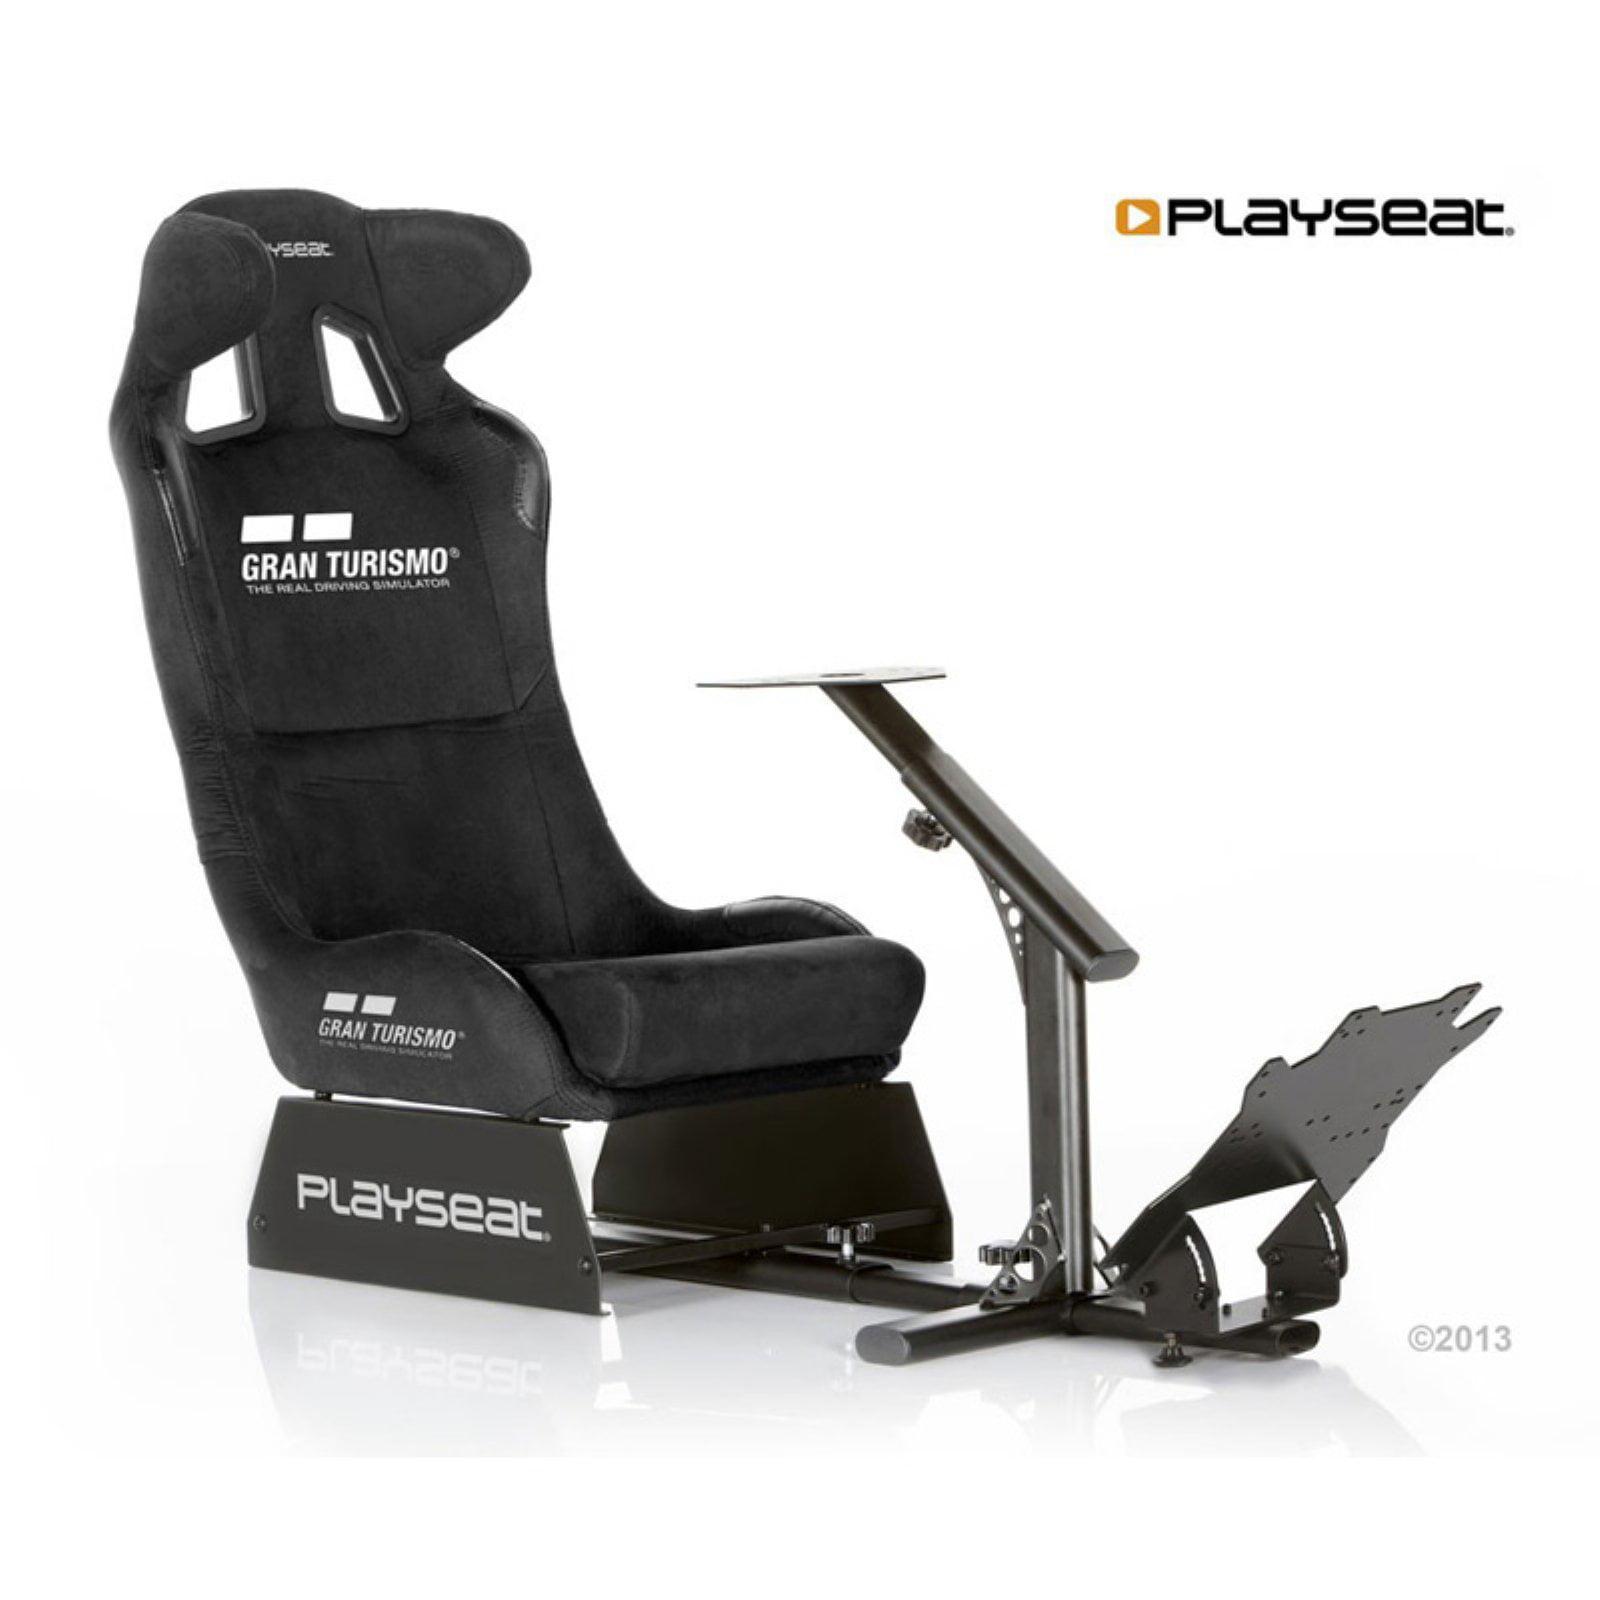 Playseat Evolution Gran Turismo Edition